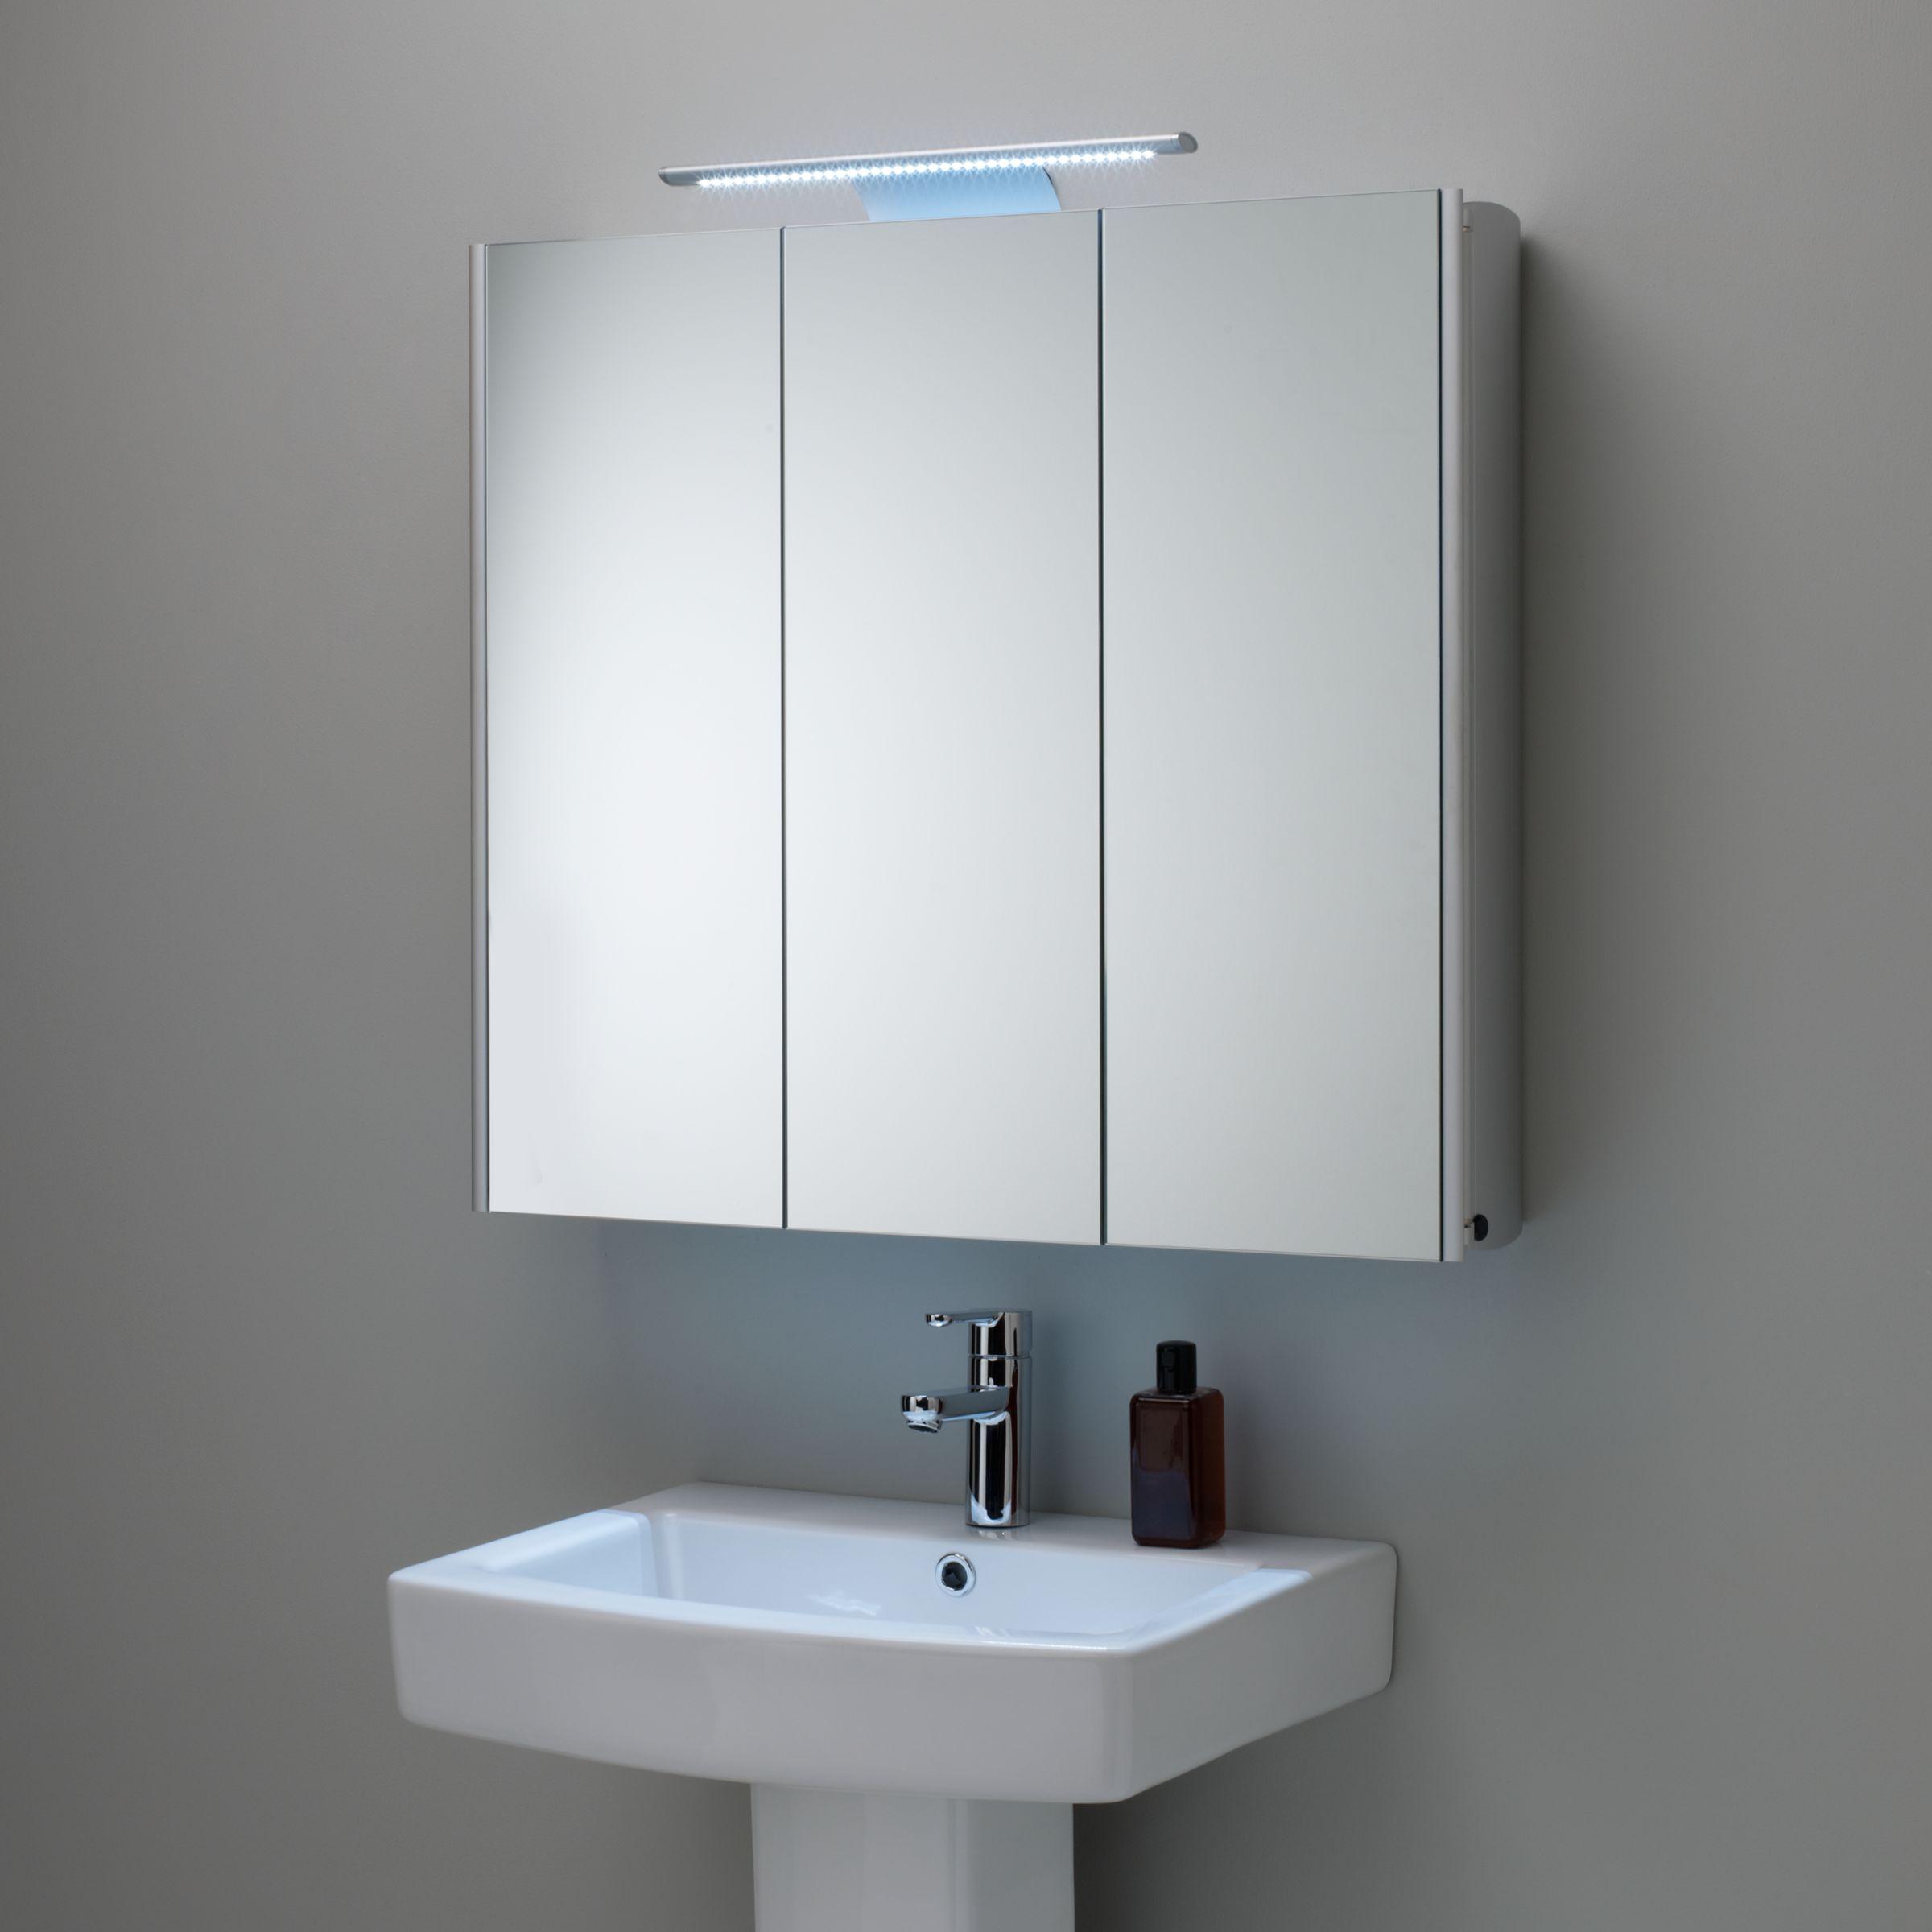 Interior Cabinet In Bathroom buy roper rhodes absolute triple mirrored illuminated bathroom cabinet online at johnlewis com